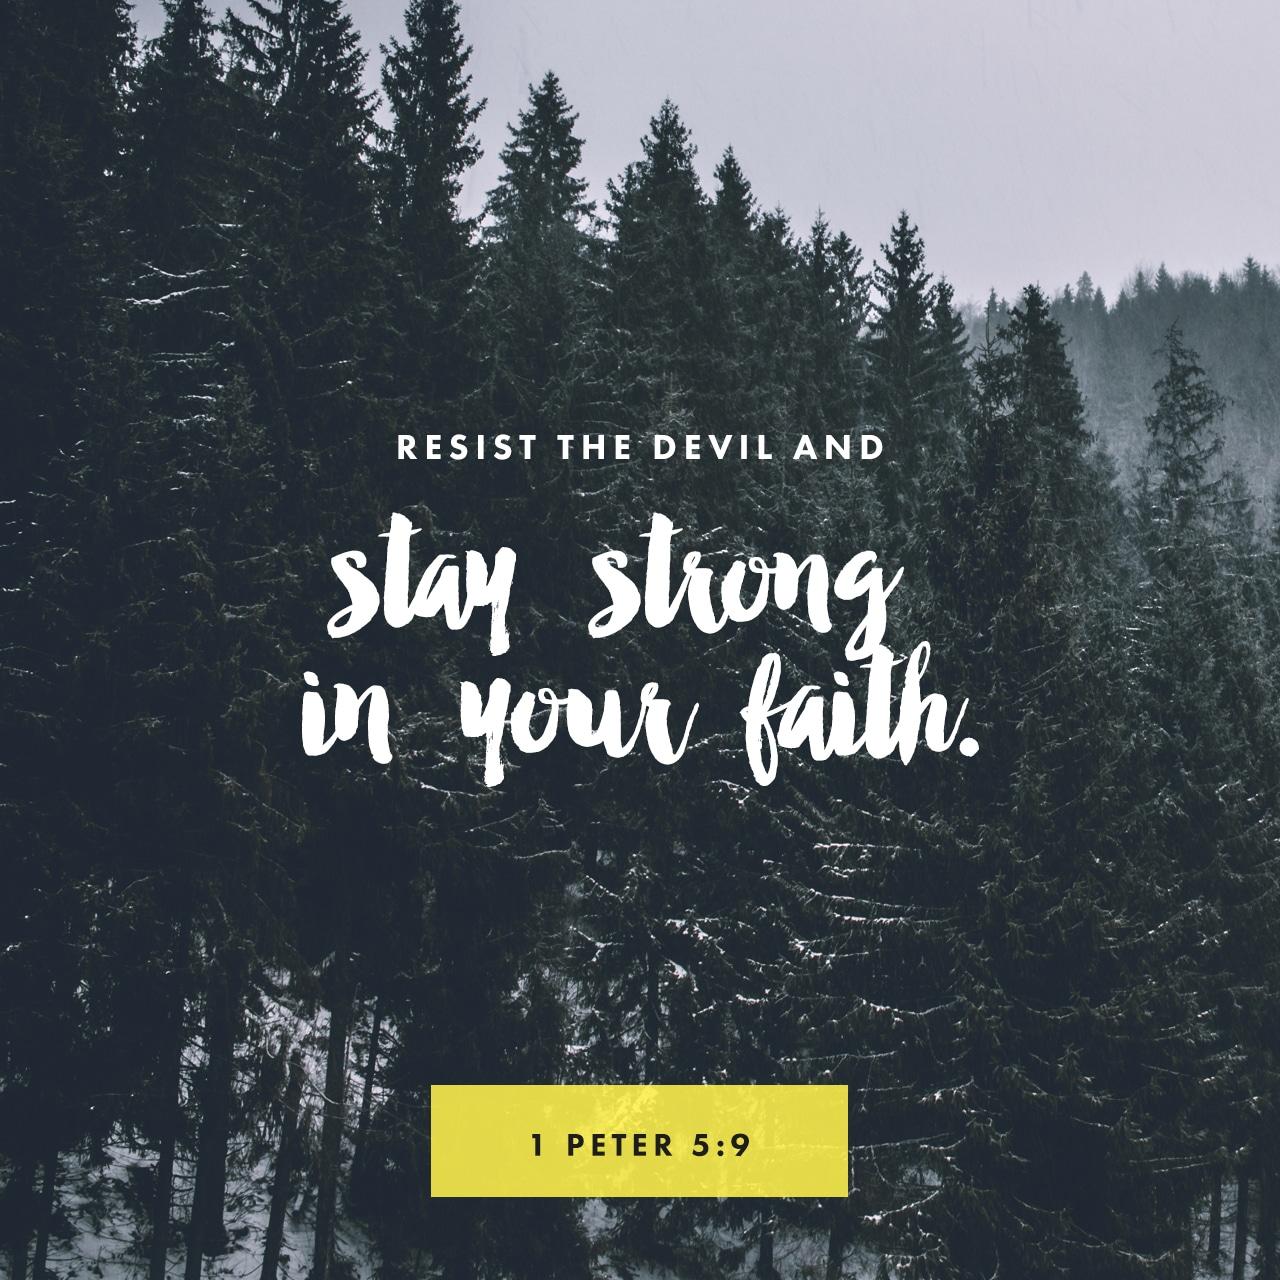 1 Peter 5:9